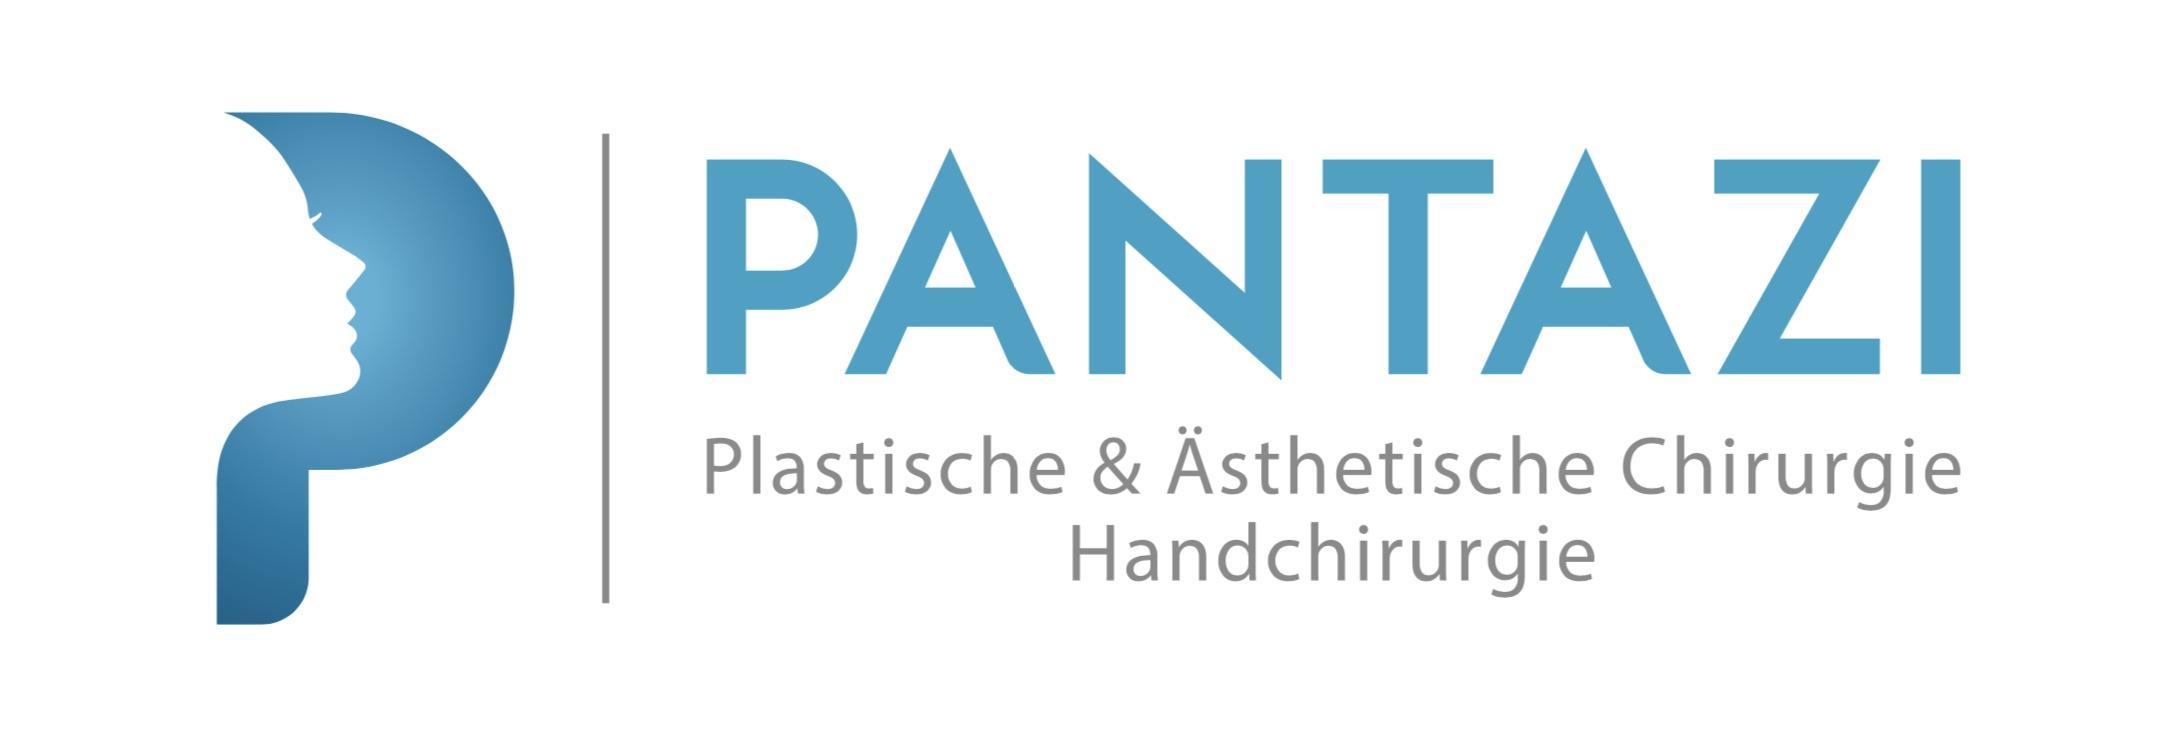 Belegarzt Dr. Pantazi